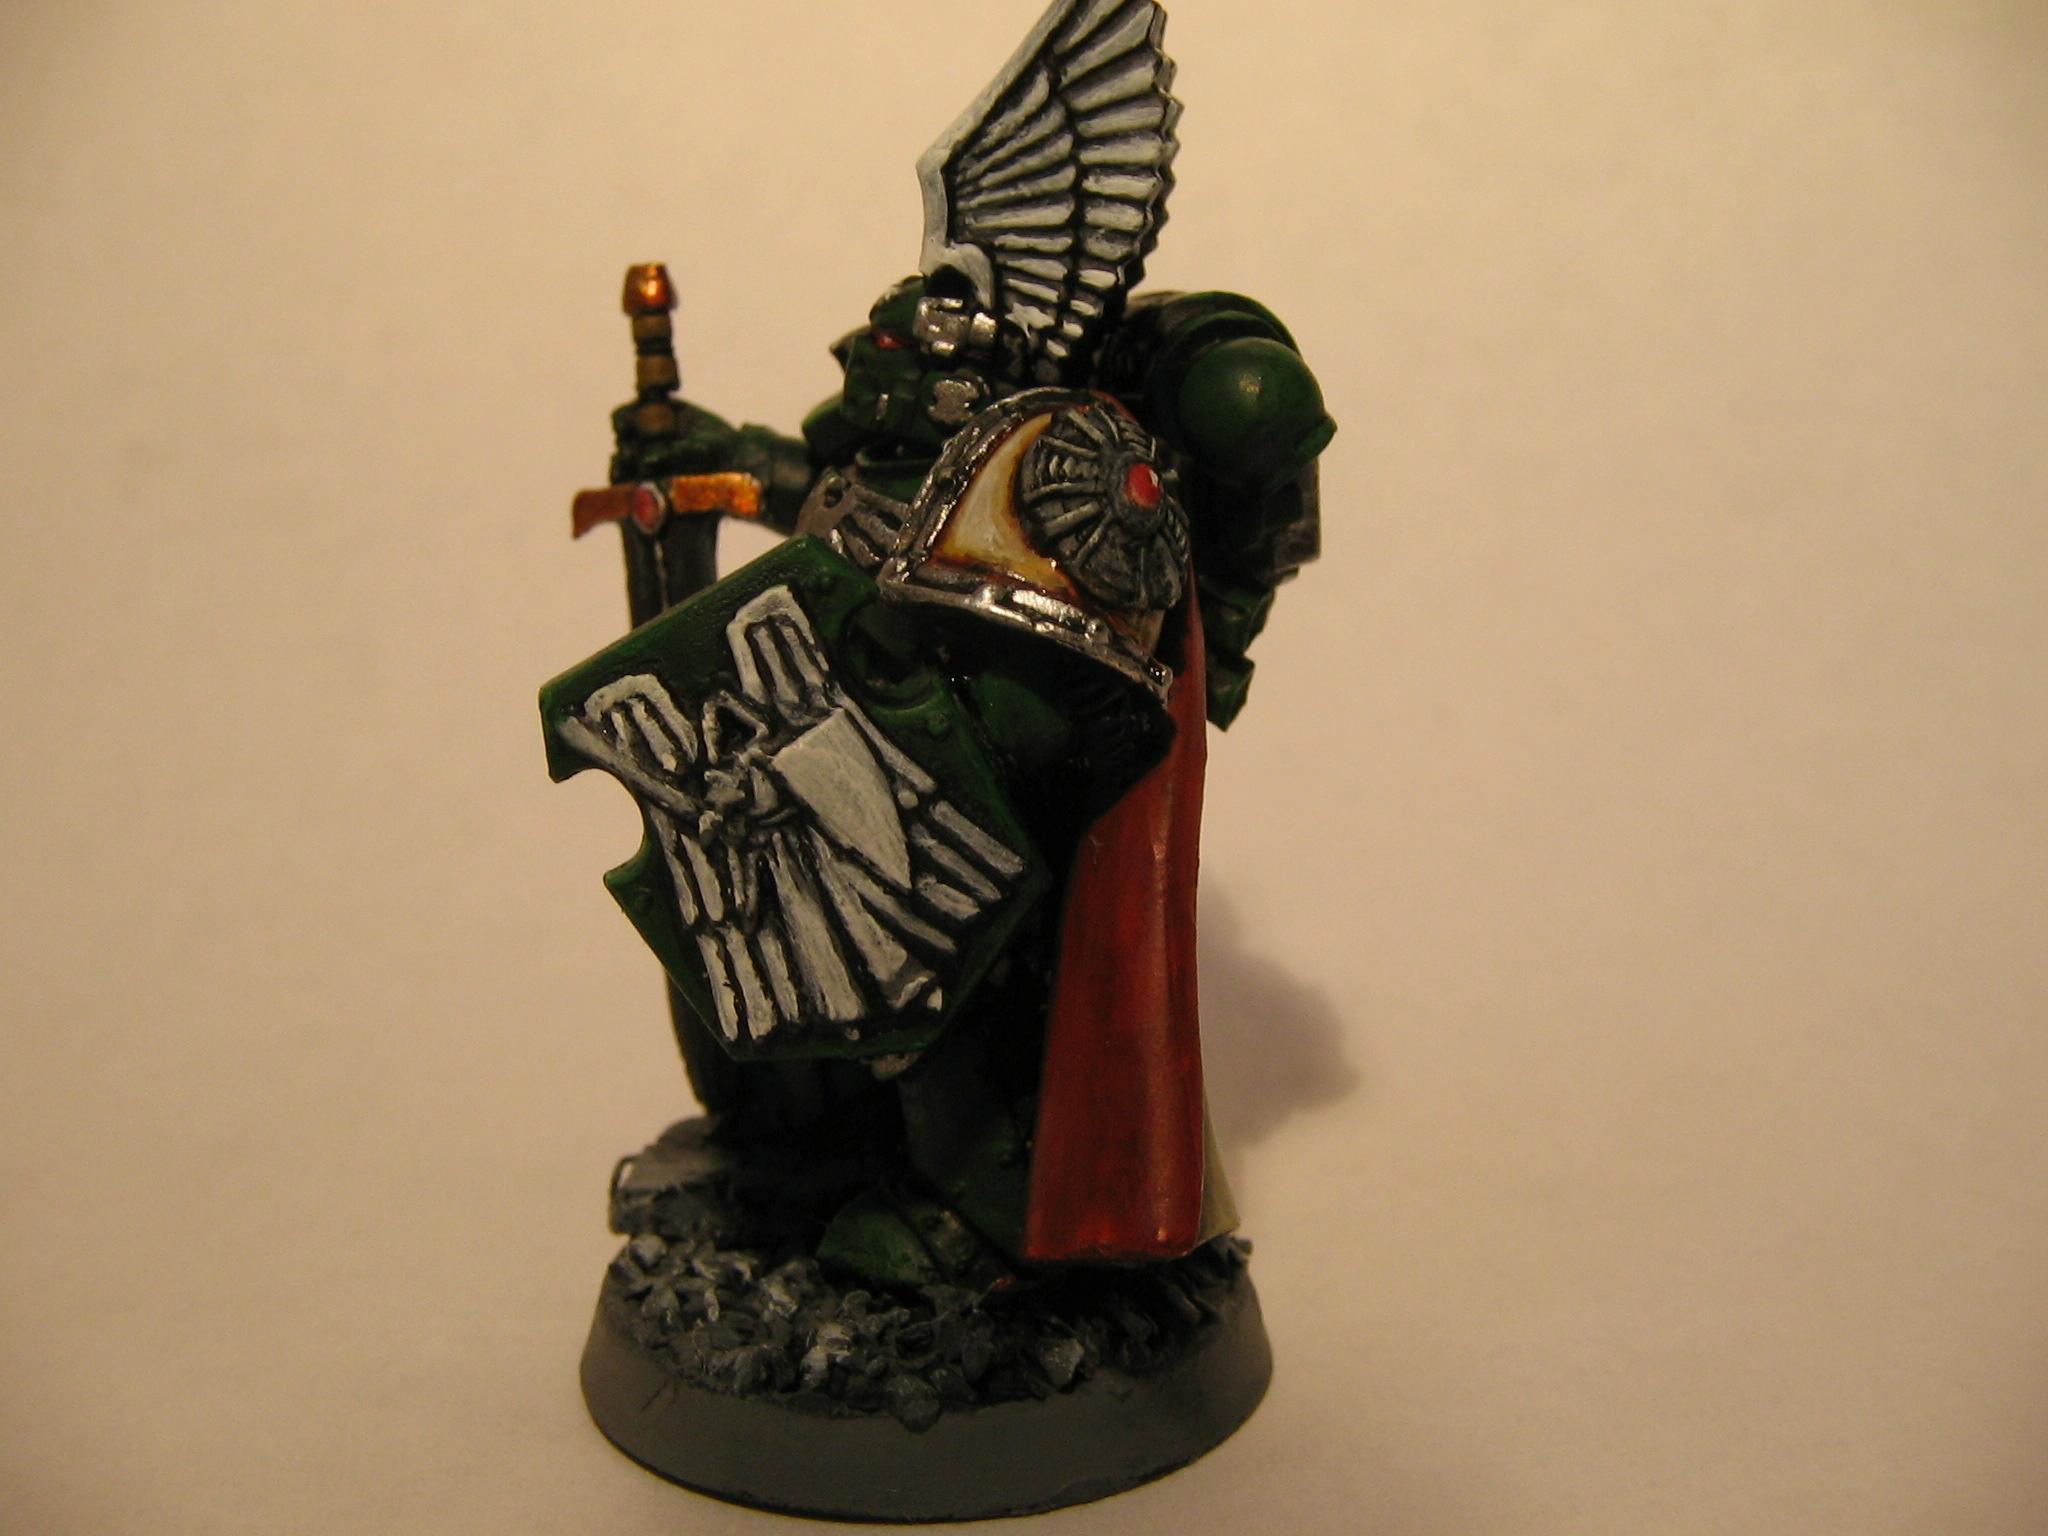 Cape, Character, Dark Angels, Space Marines, Warhammer 40,000